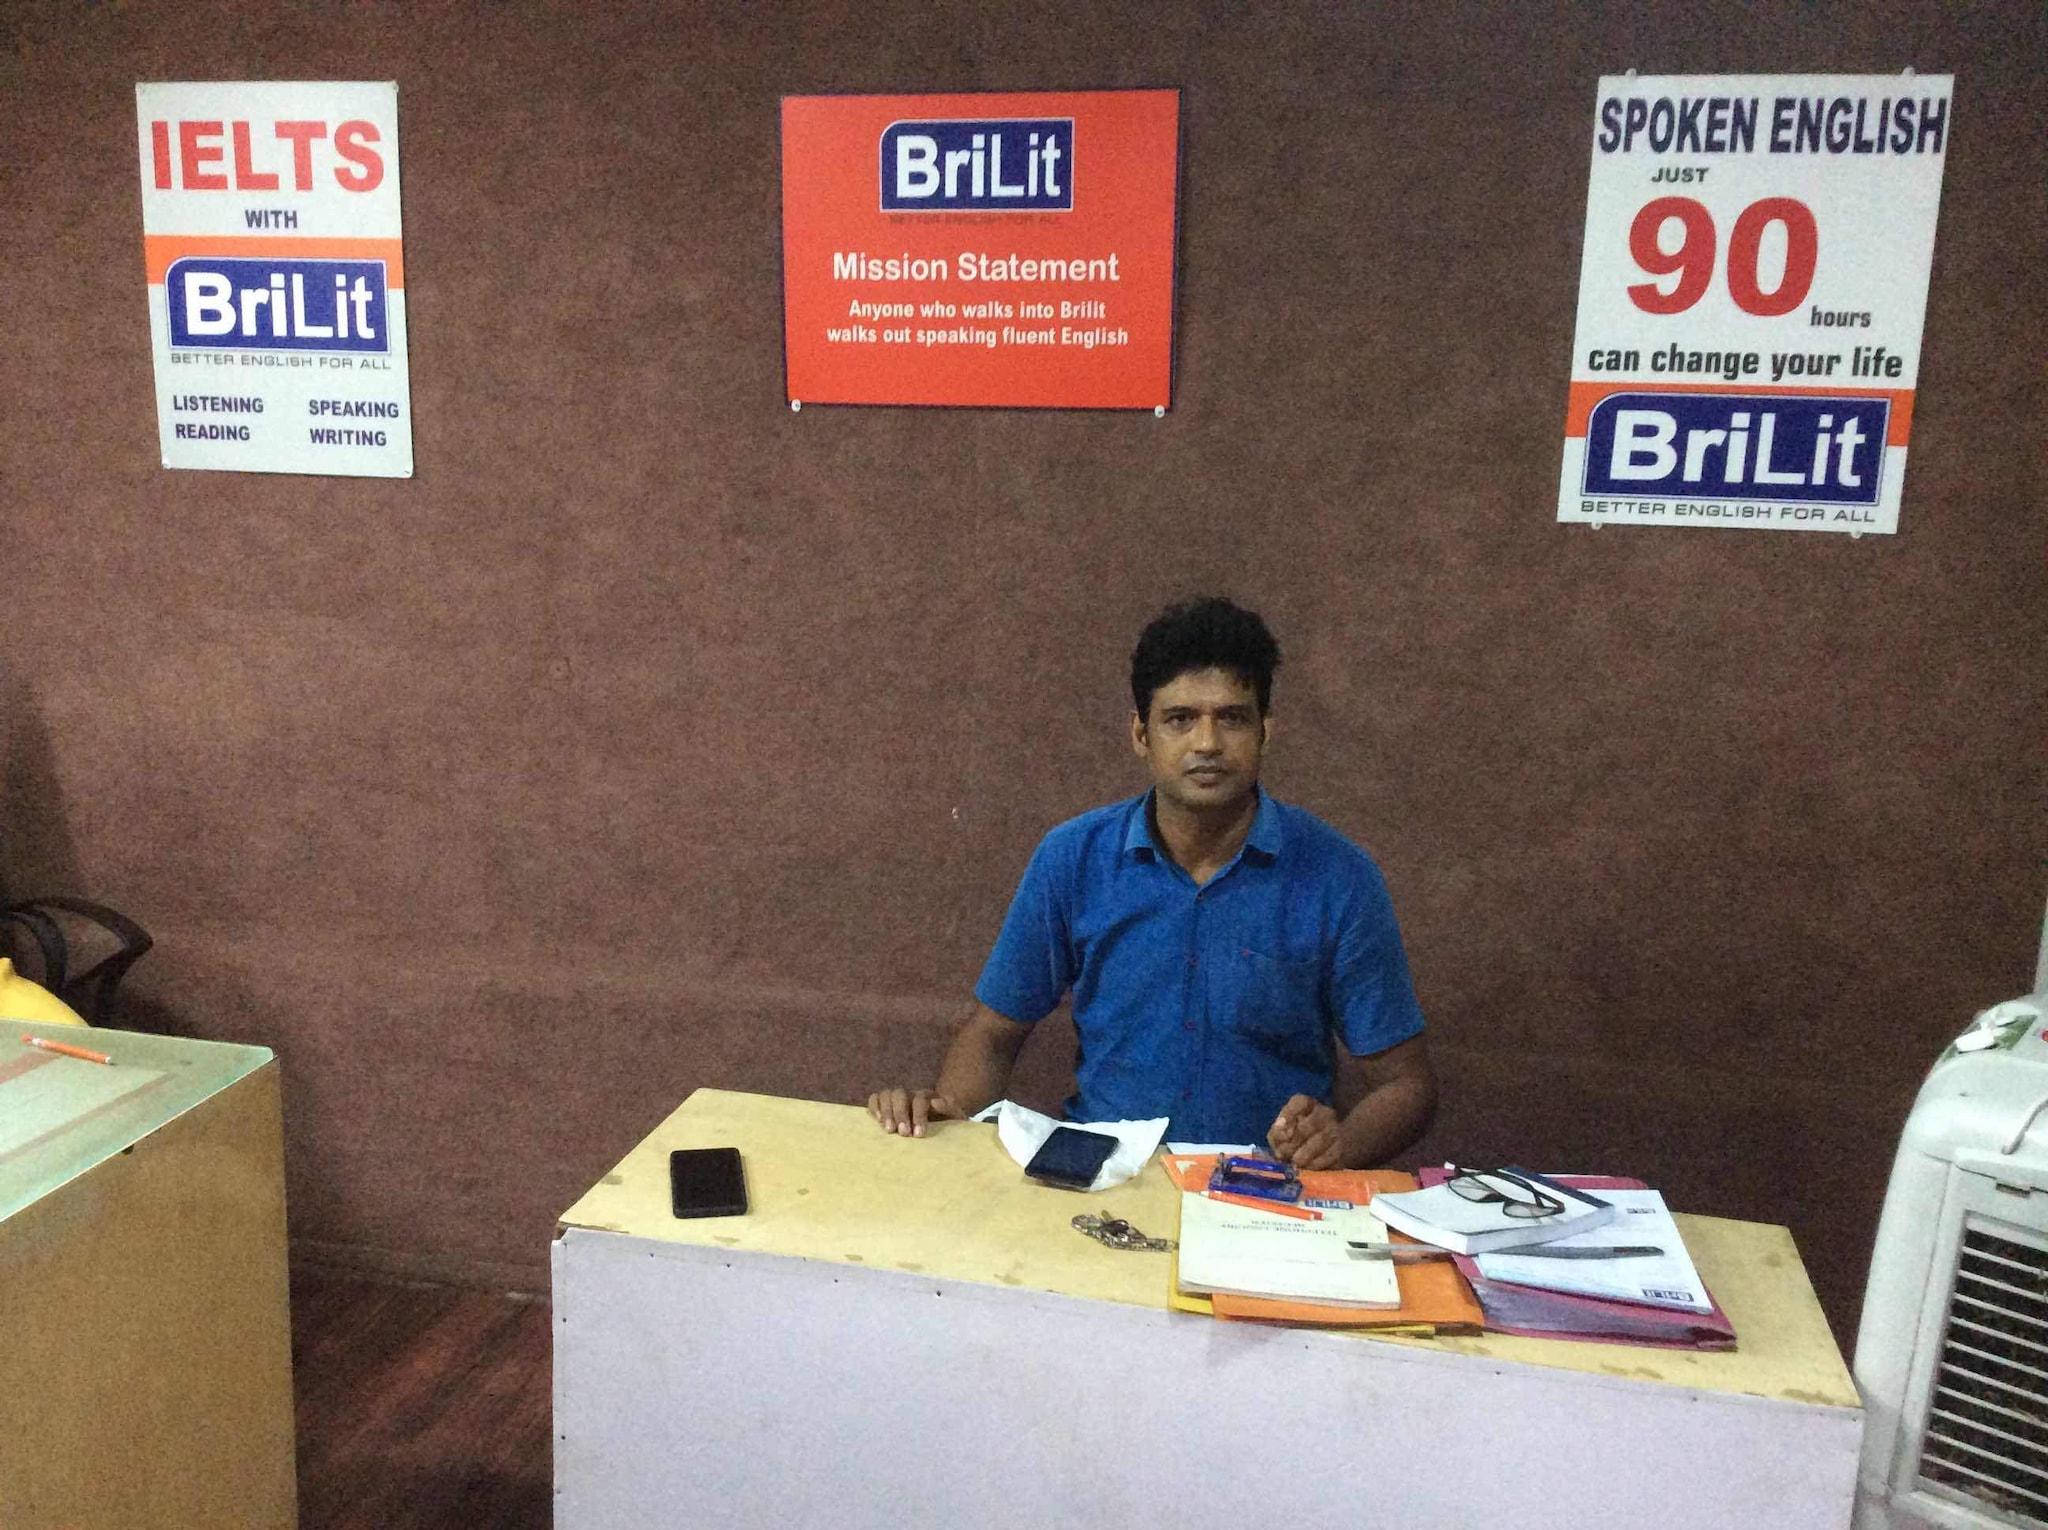 Top 100 Spoken English Classes in Varanasi - Best English